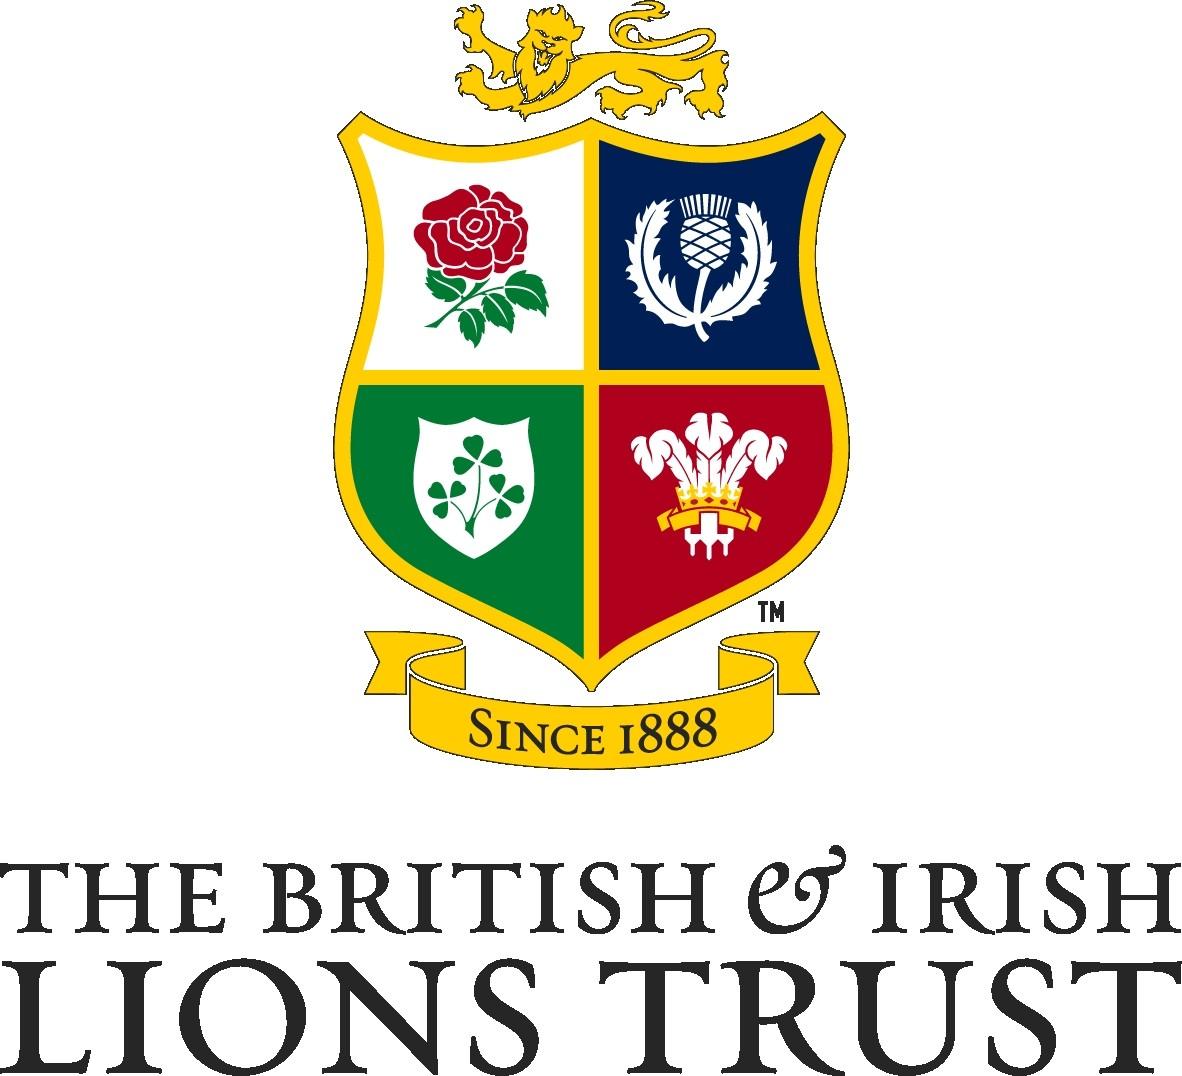 The British & Irish Lions Trust